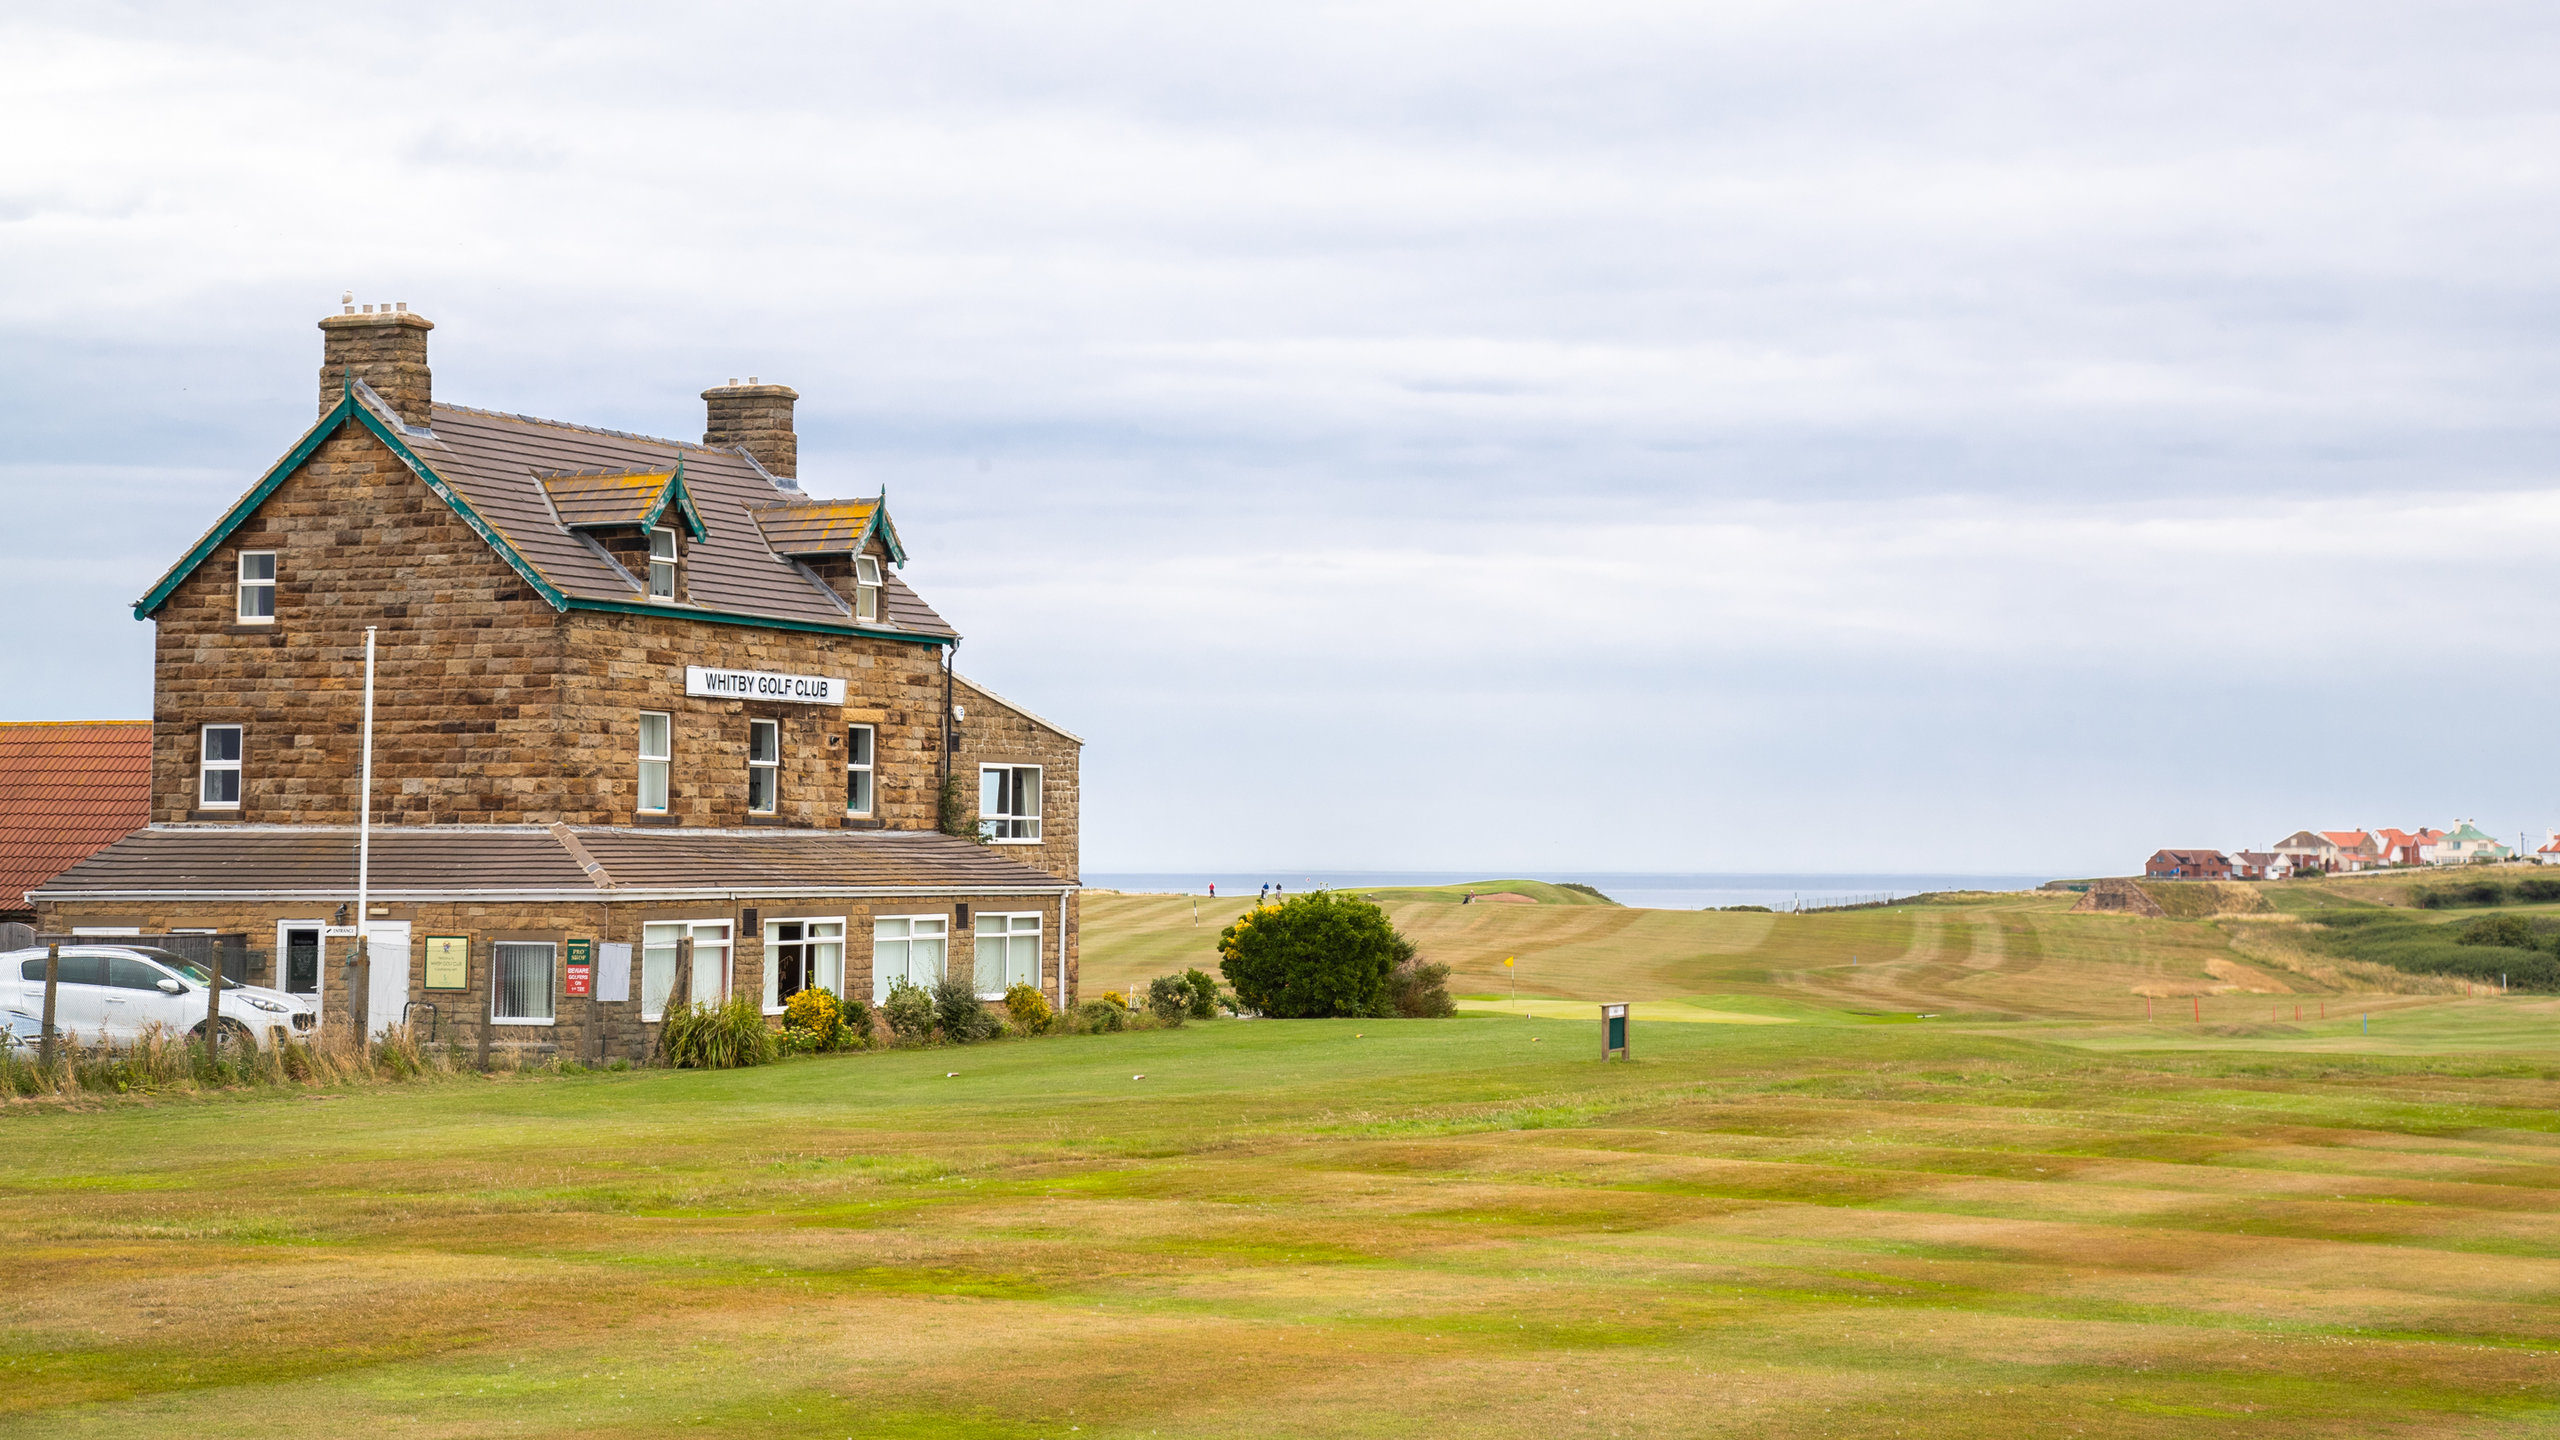 Whitby Golf Club, Whitby, England, United Kingdom